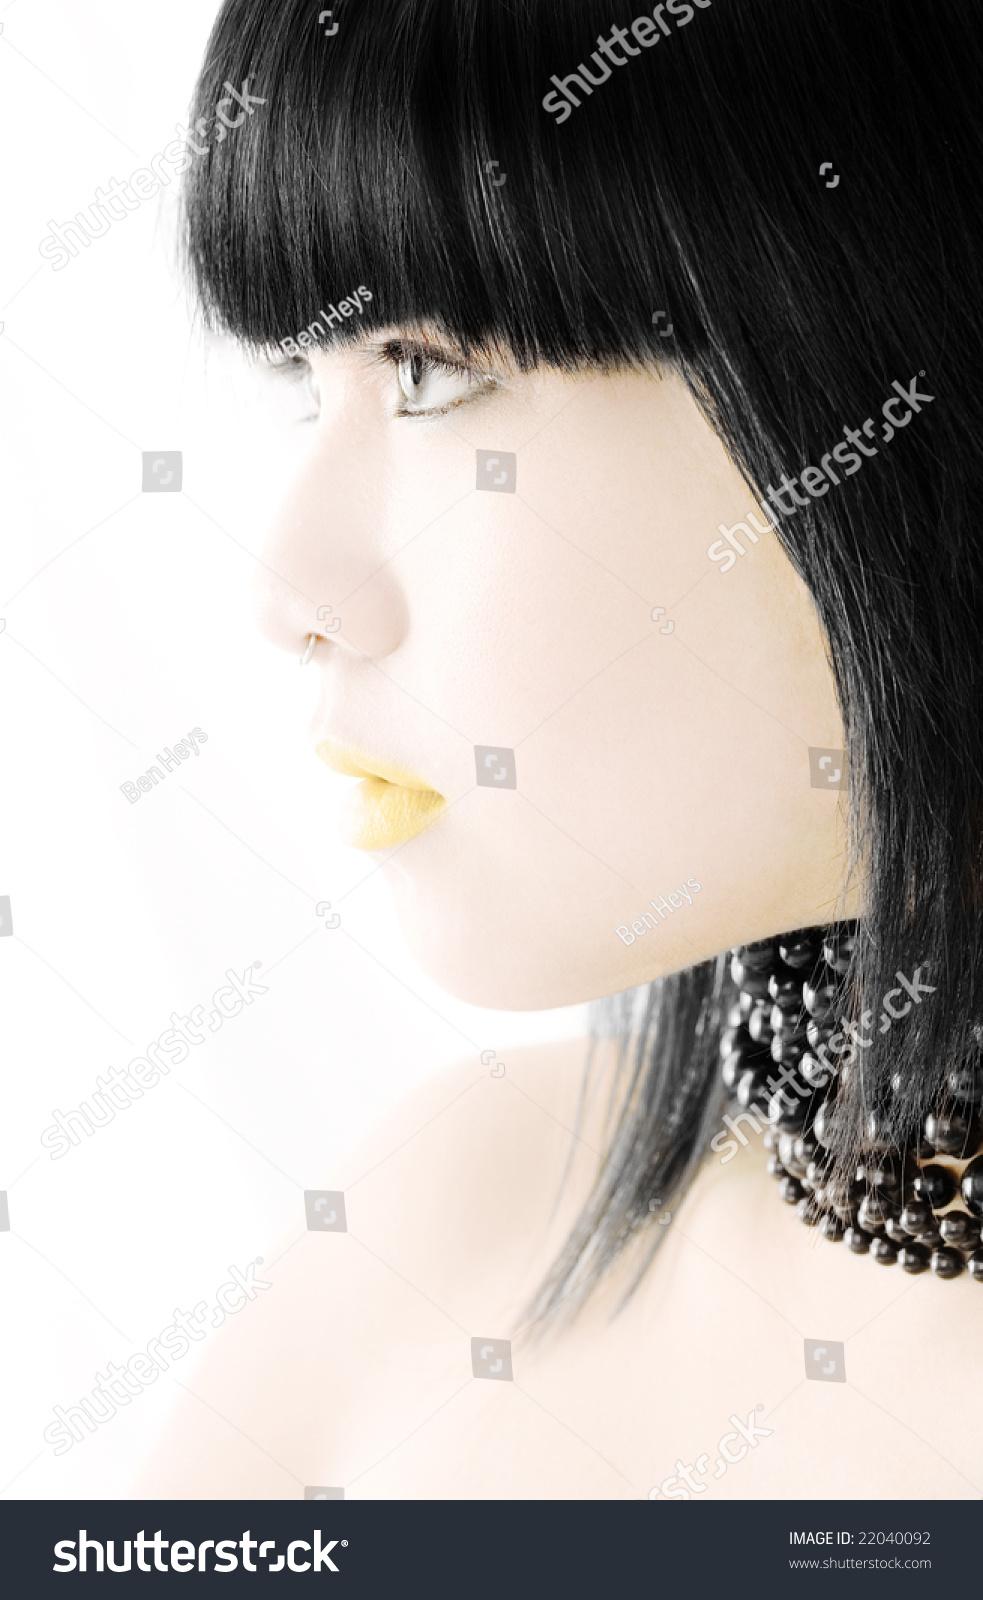 Vietnamese Beauty Model Portrait On White Stock Photo 22040092 ...